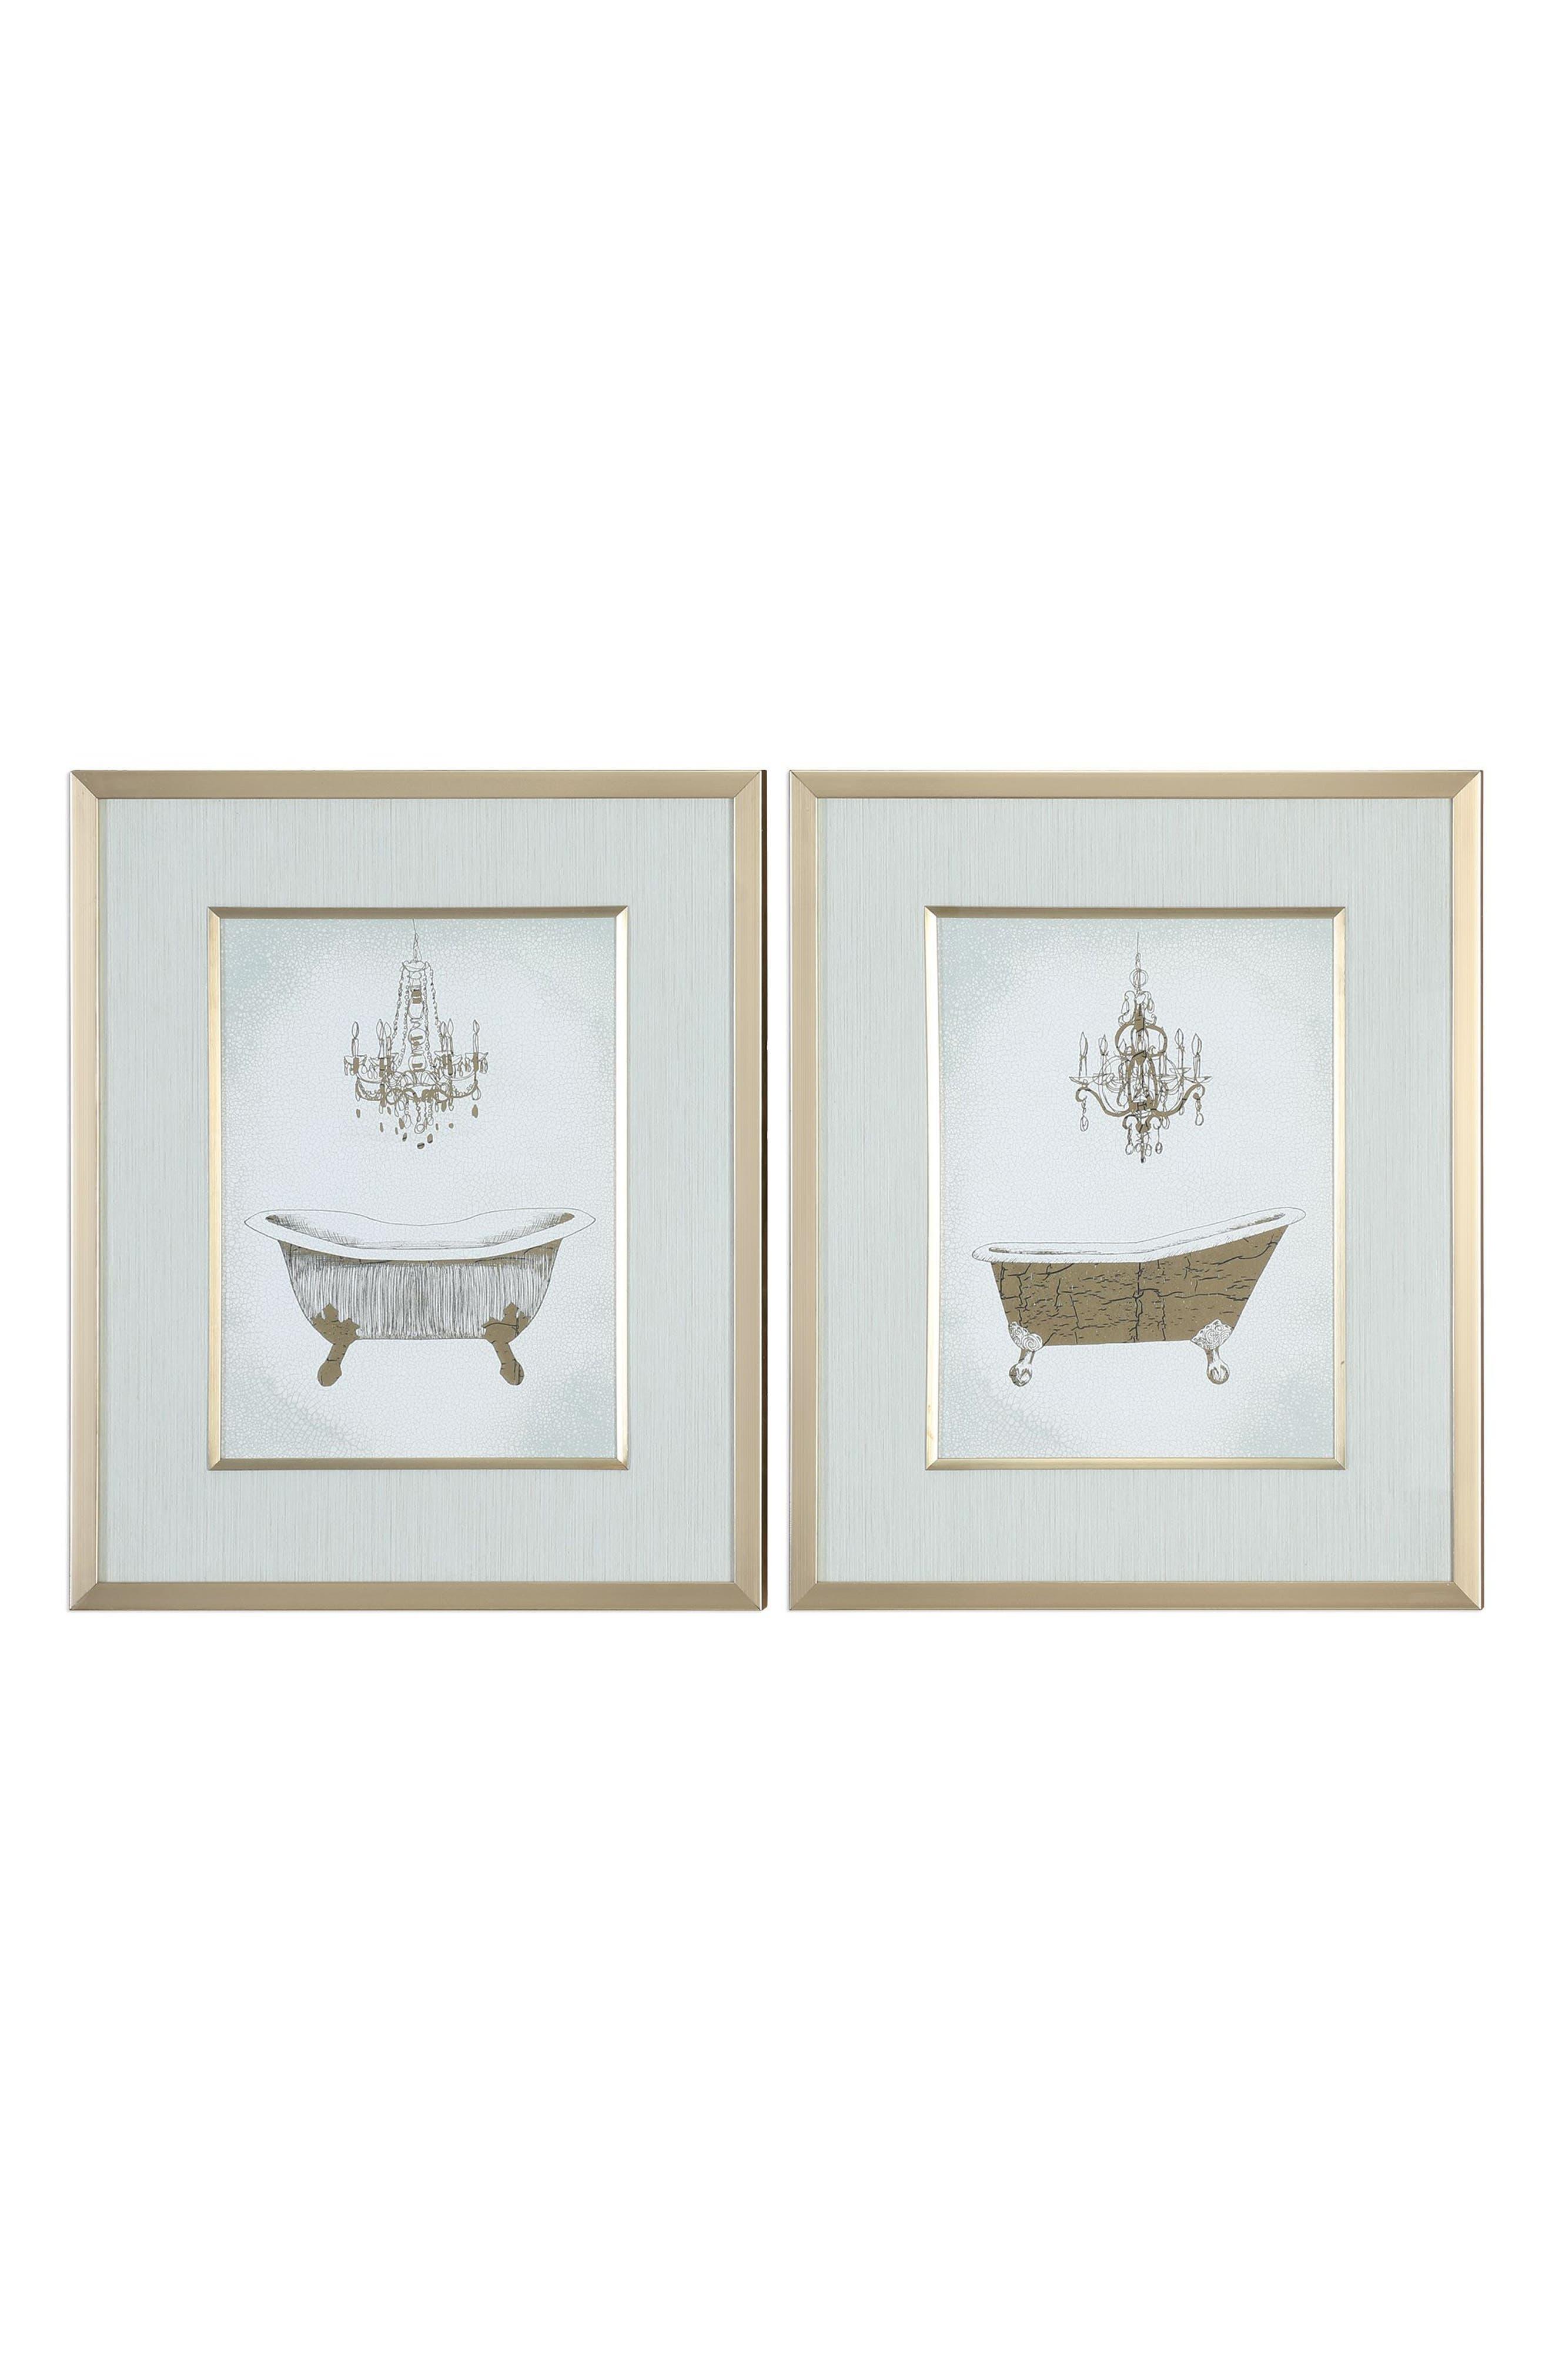 Alternate Image 1 Selected - Uttermost Gilded Bath Set of 2 Art Prints